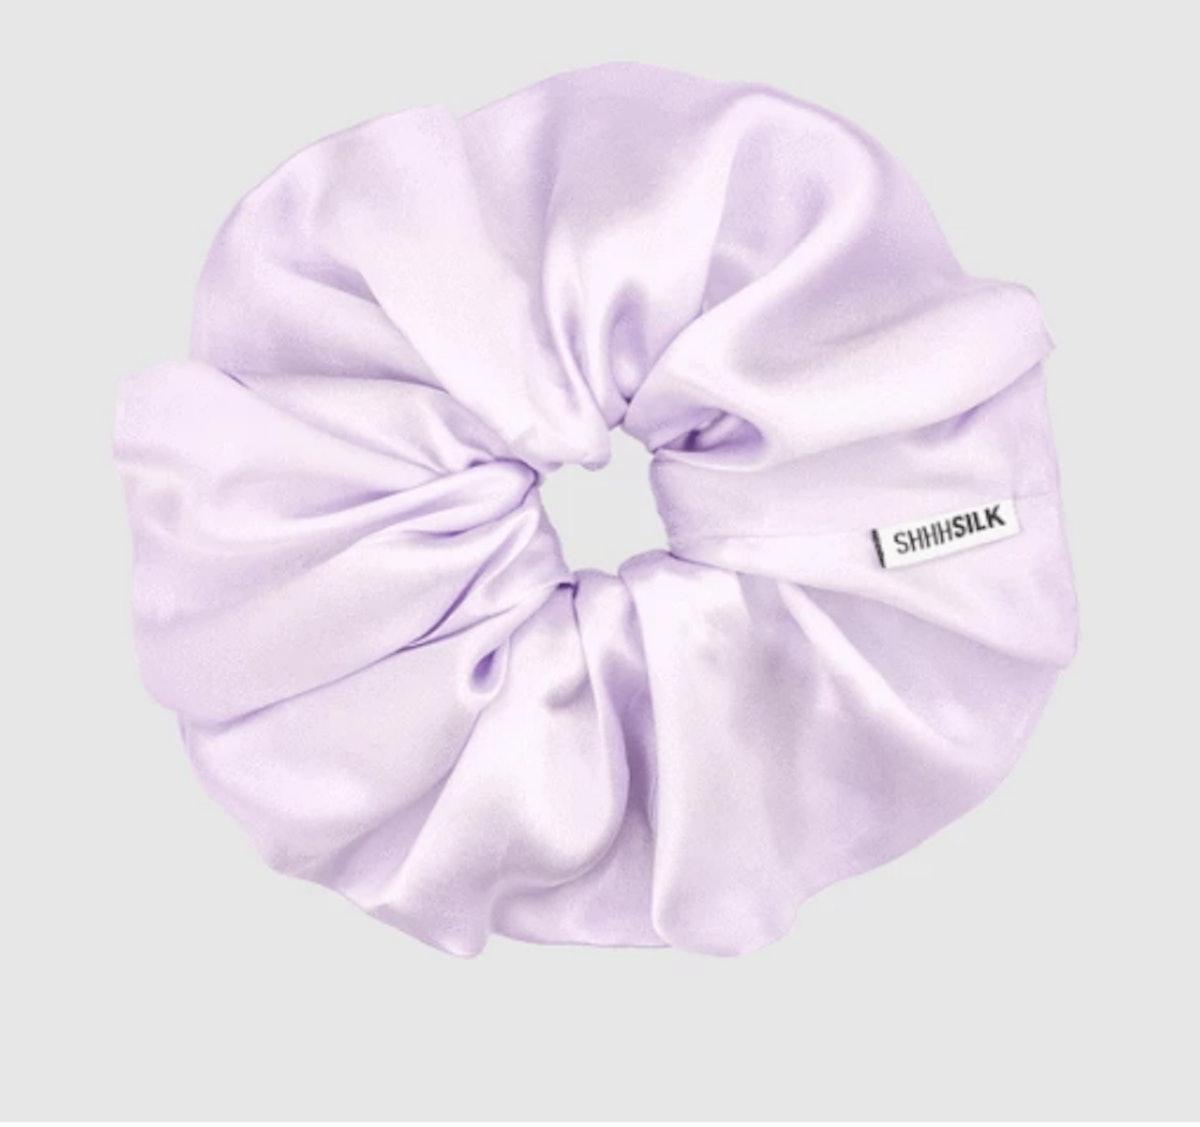 SHHH Silk Oversized Lilac Silk Scrunchie